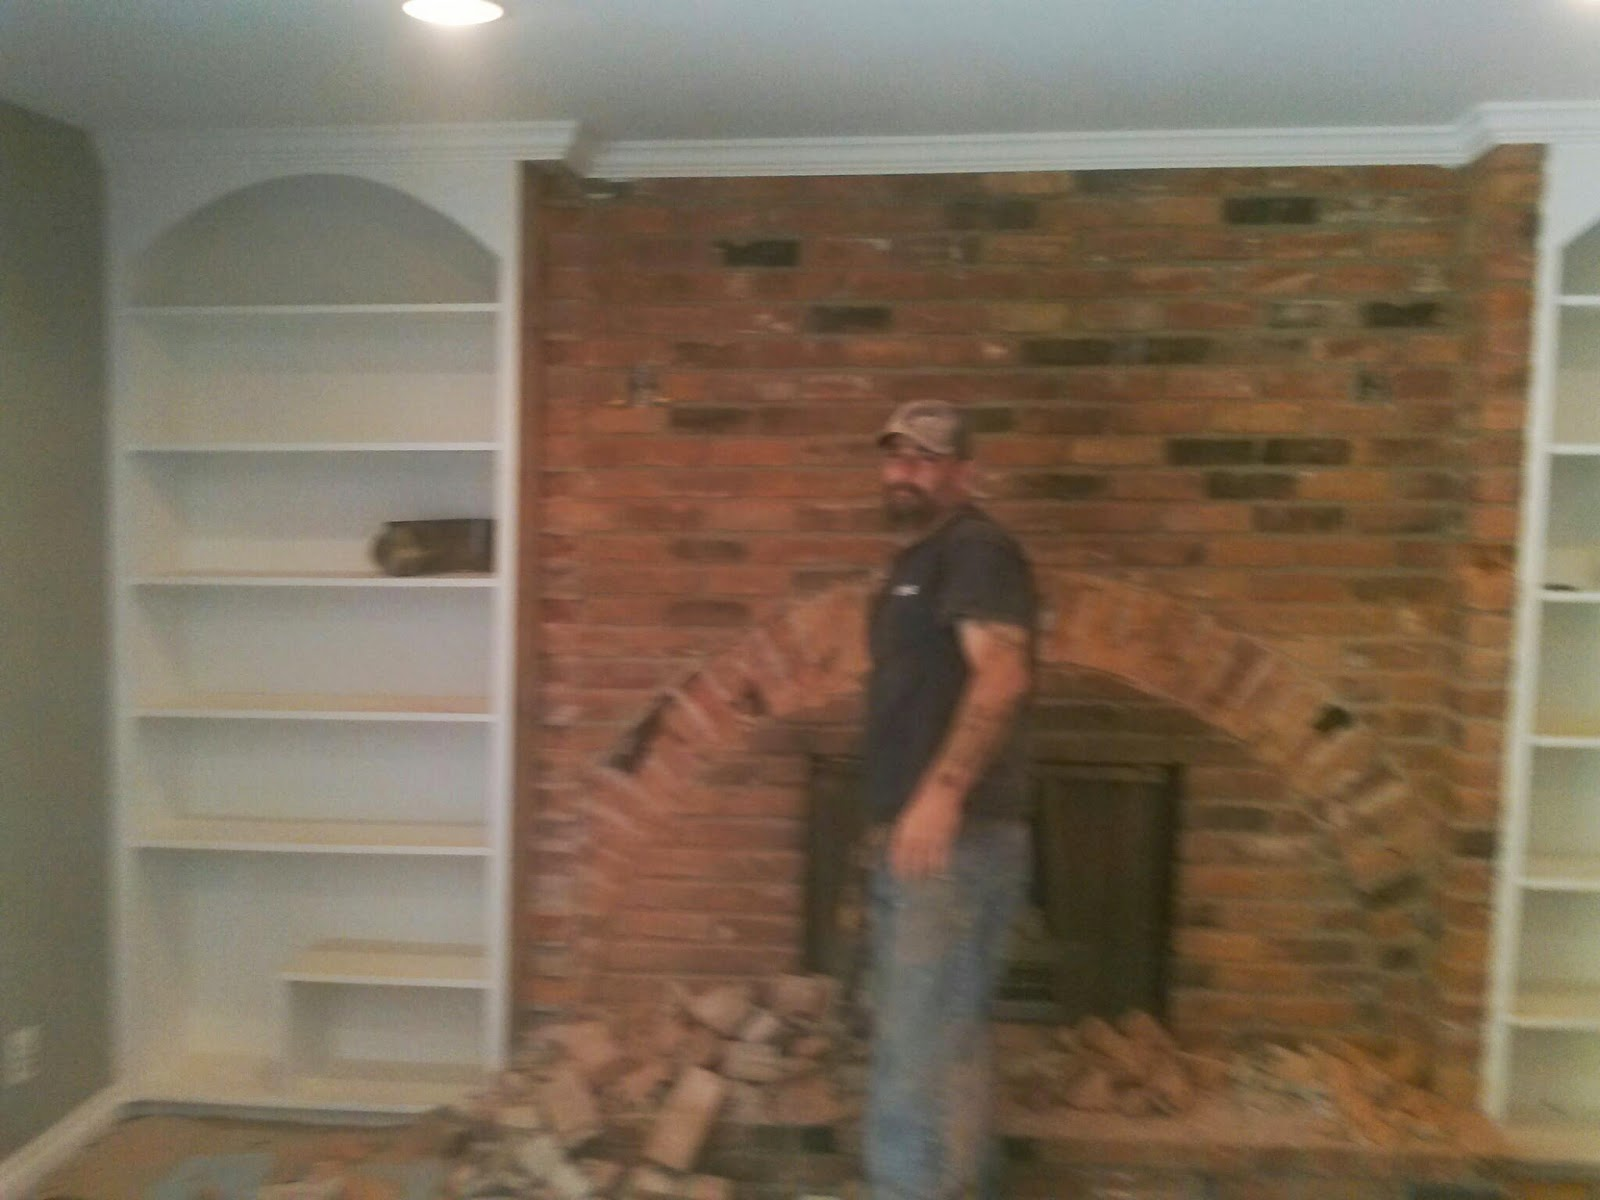 Clarkston Fireplaces Repair 313 355 3719